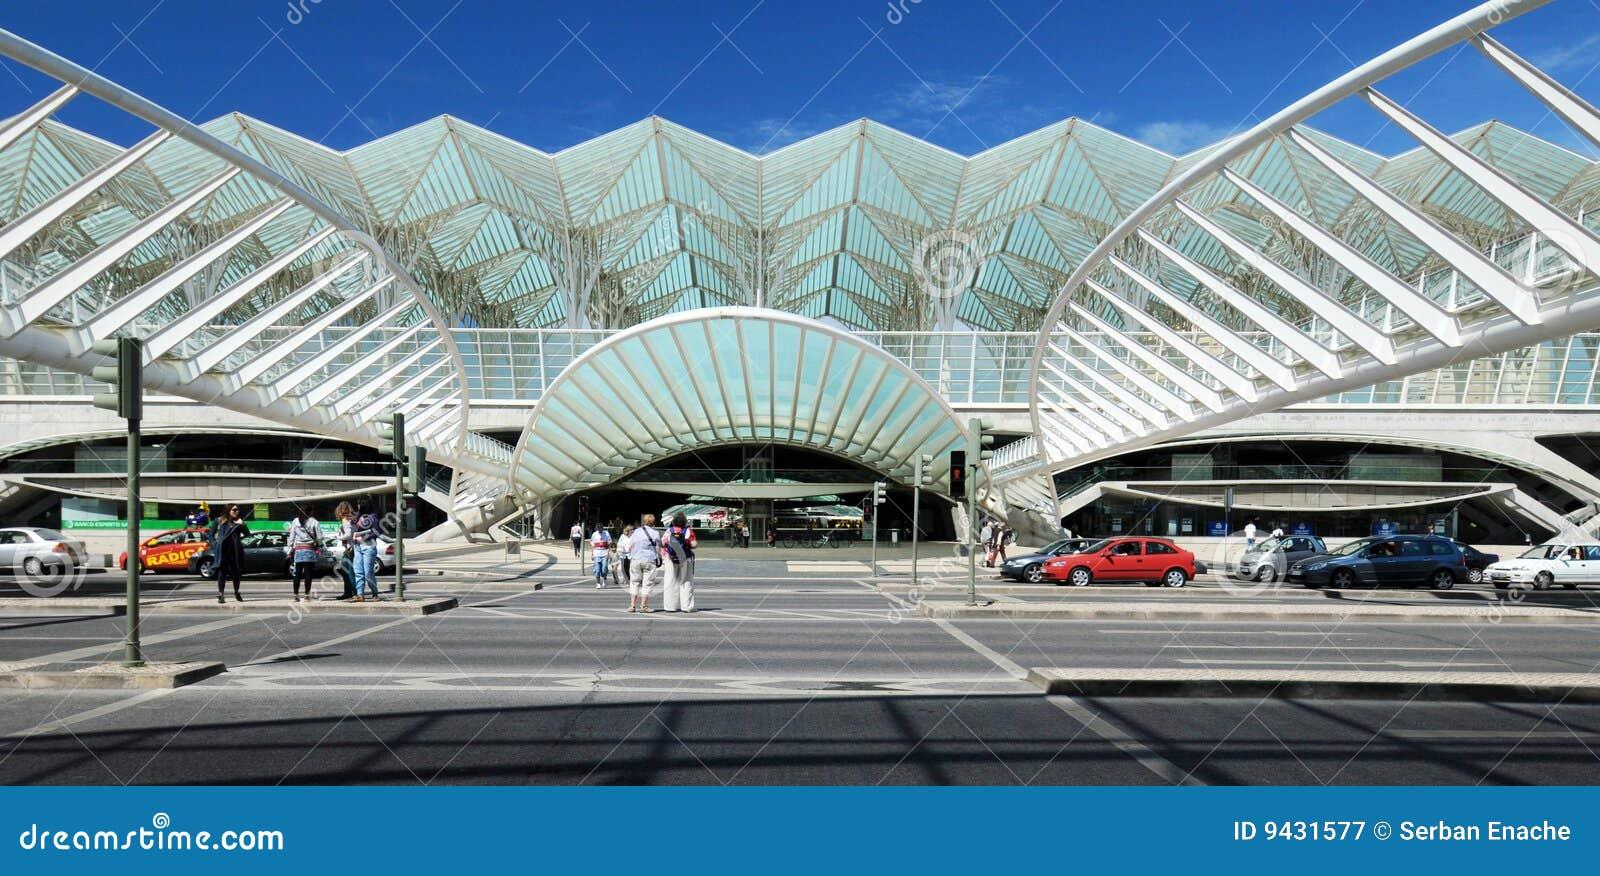 Railway station, Lisbon